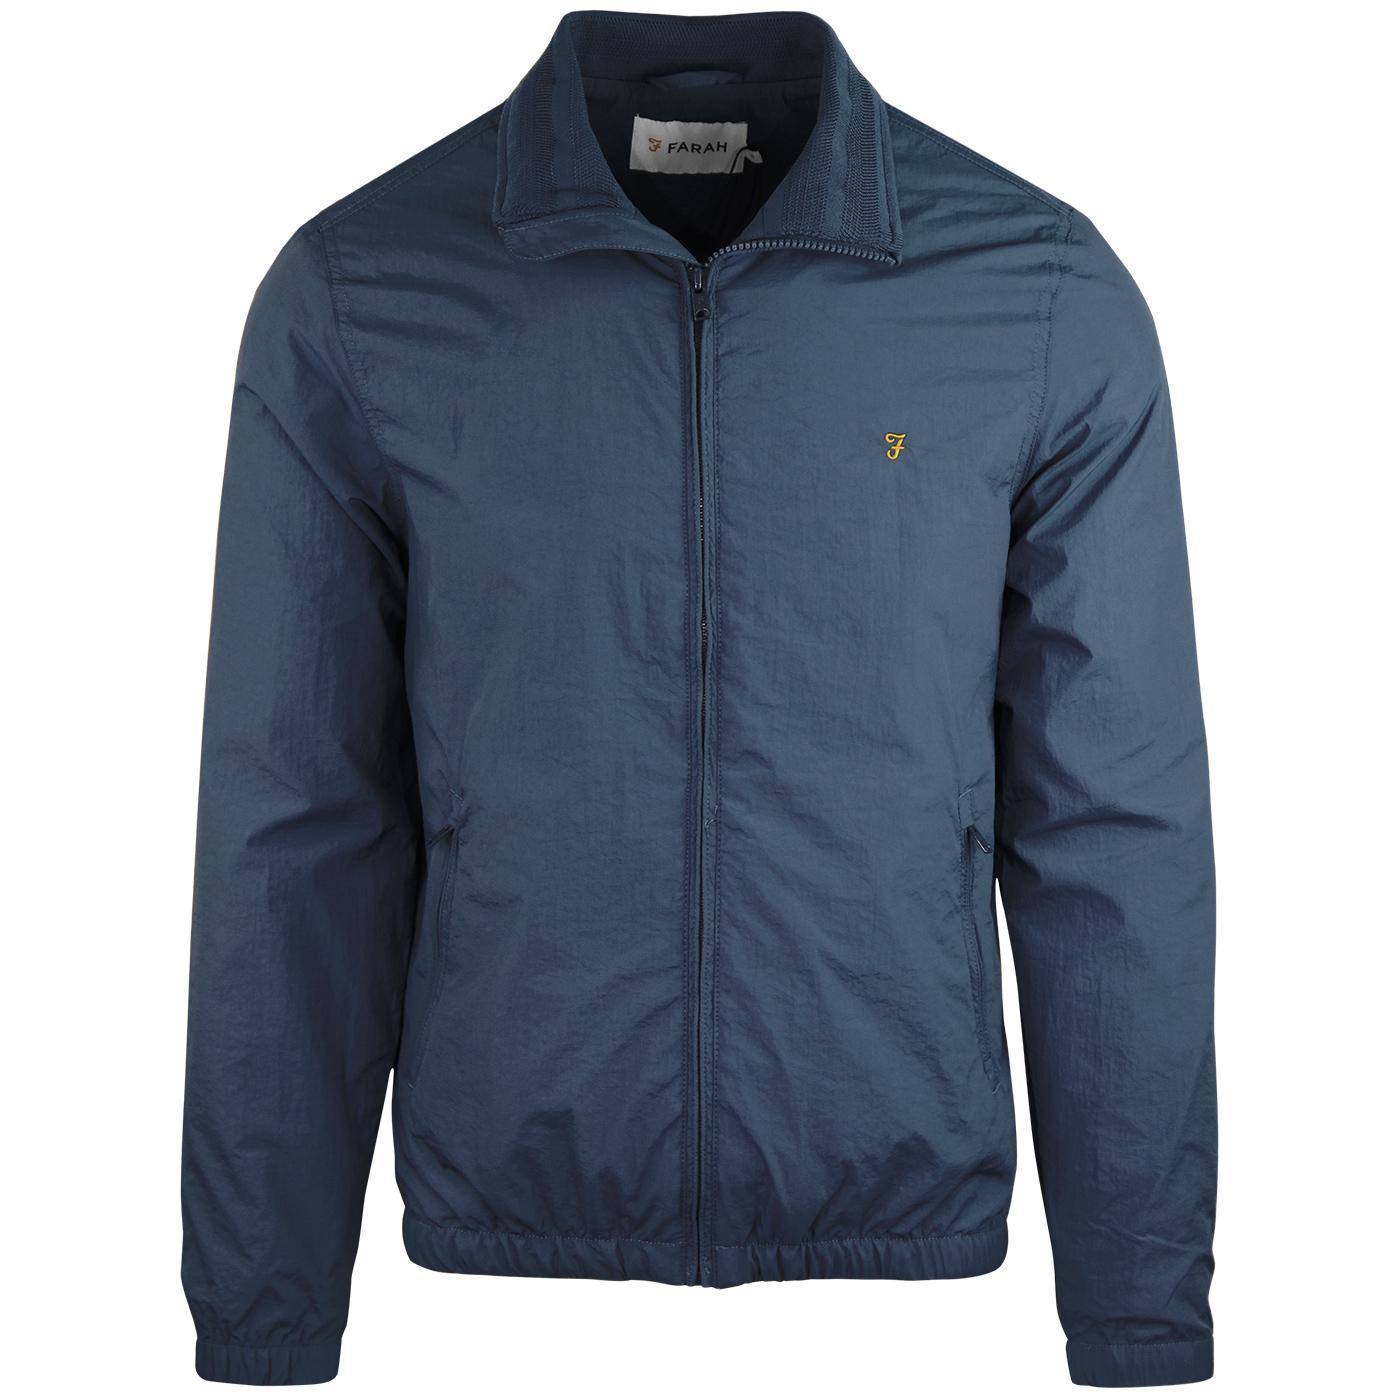 Dougans FARAH Blouson Windbreaker Jacket (Blue)